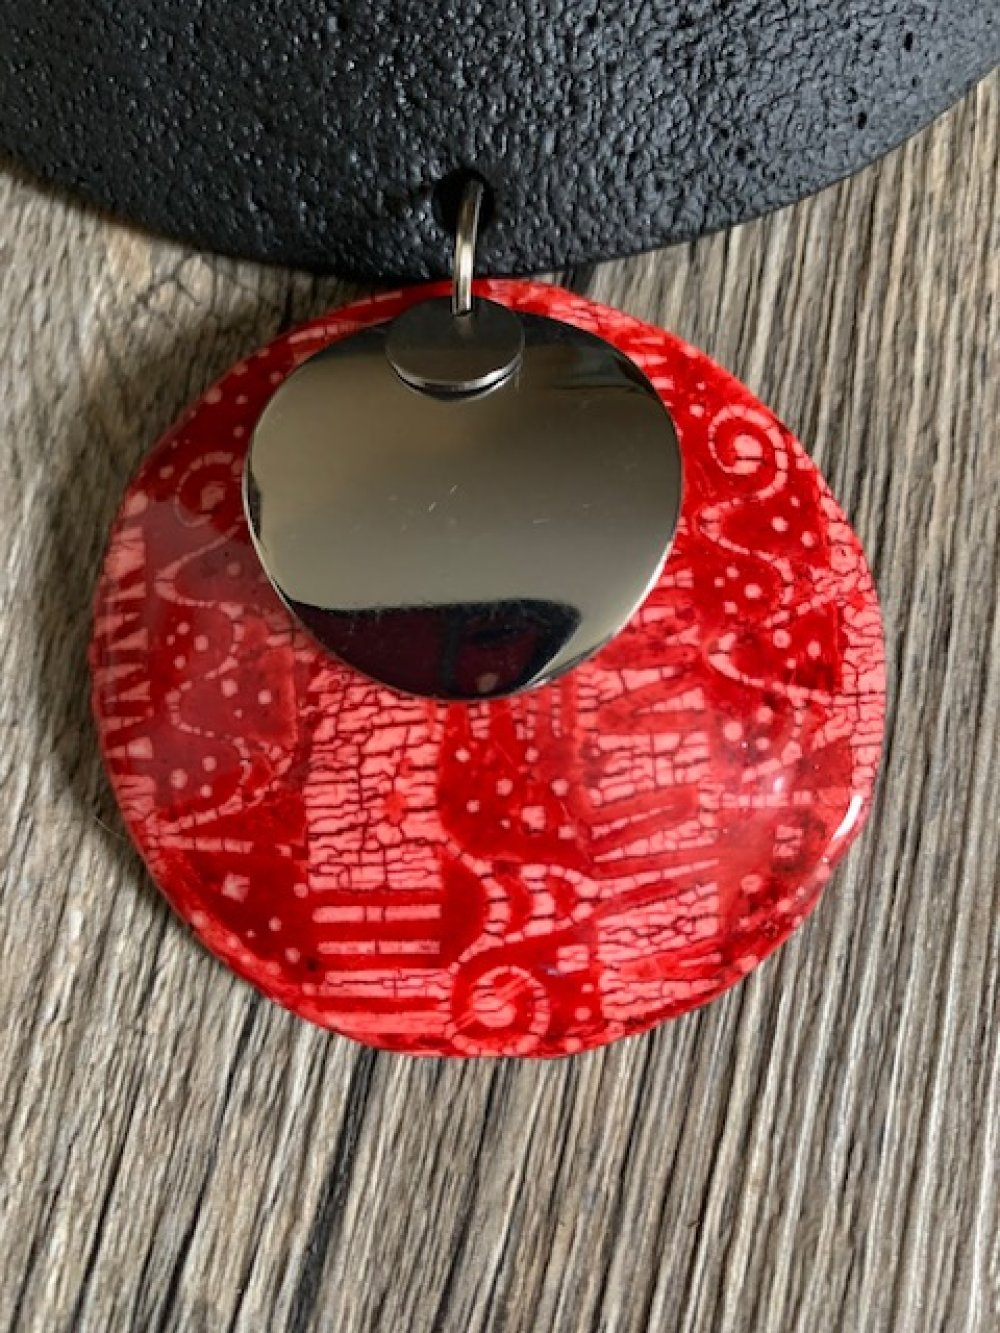 Torque motif ethnique rouge effet batik